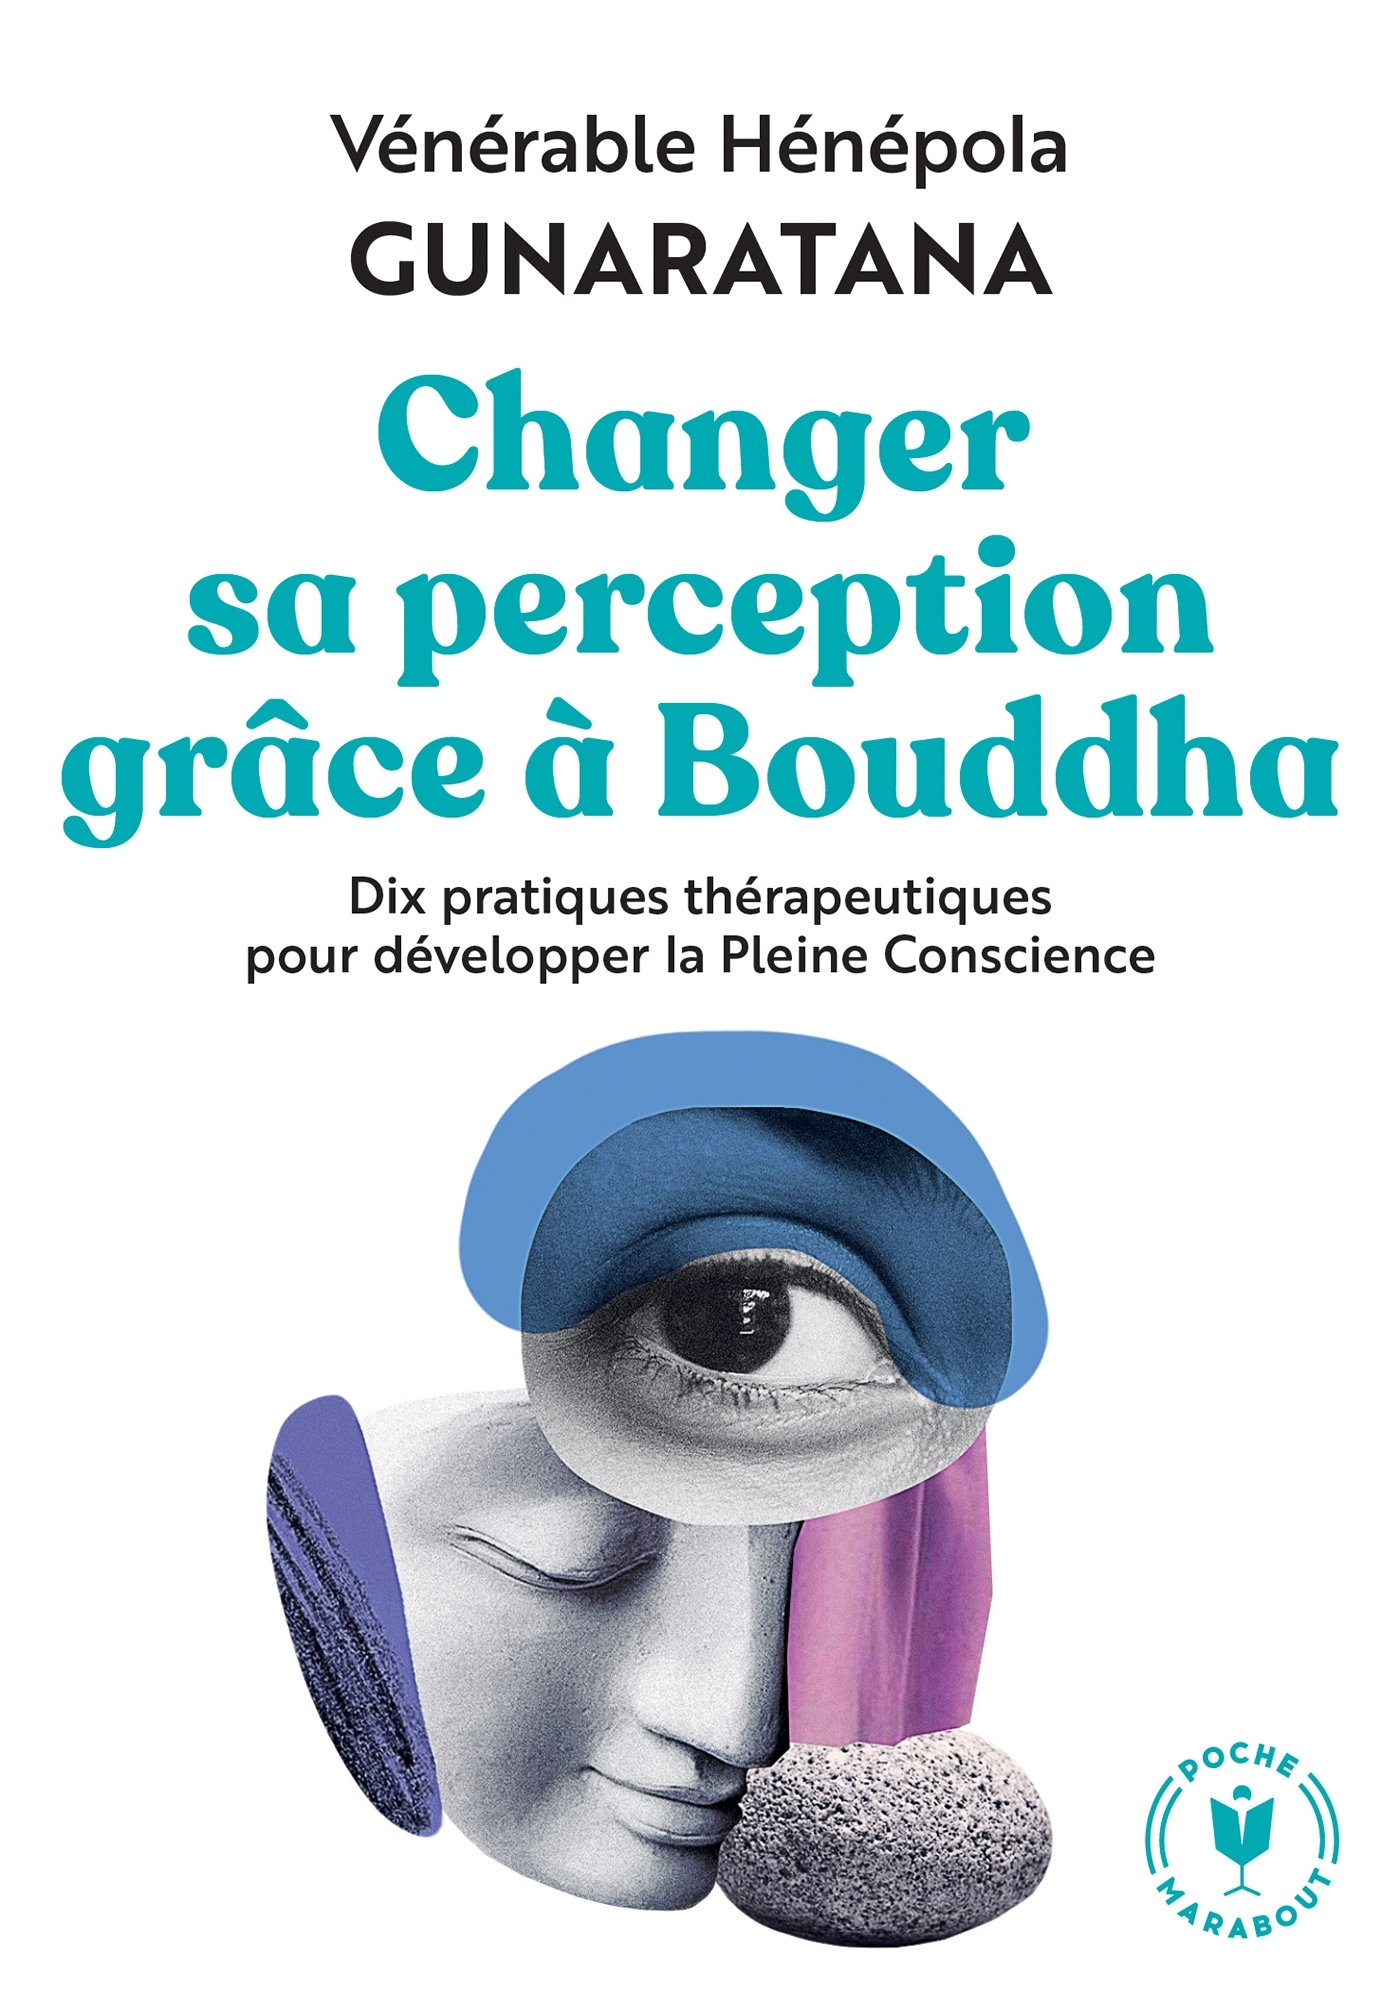 CHANGER SA PERCEPTION GRACE A BOUDDHA